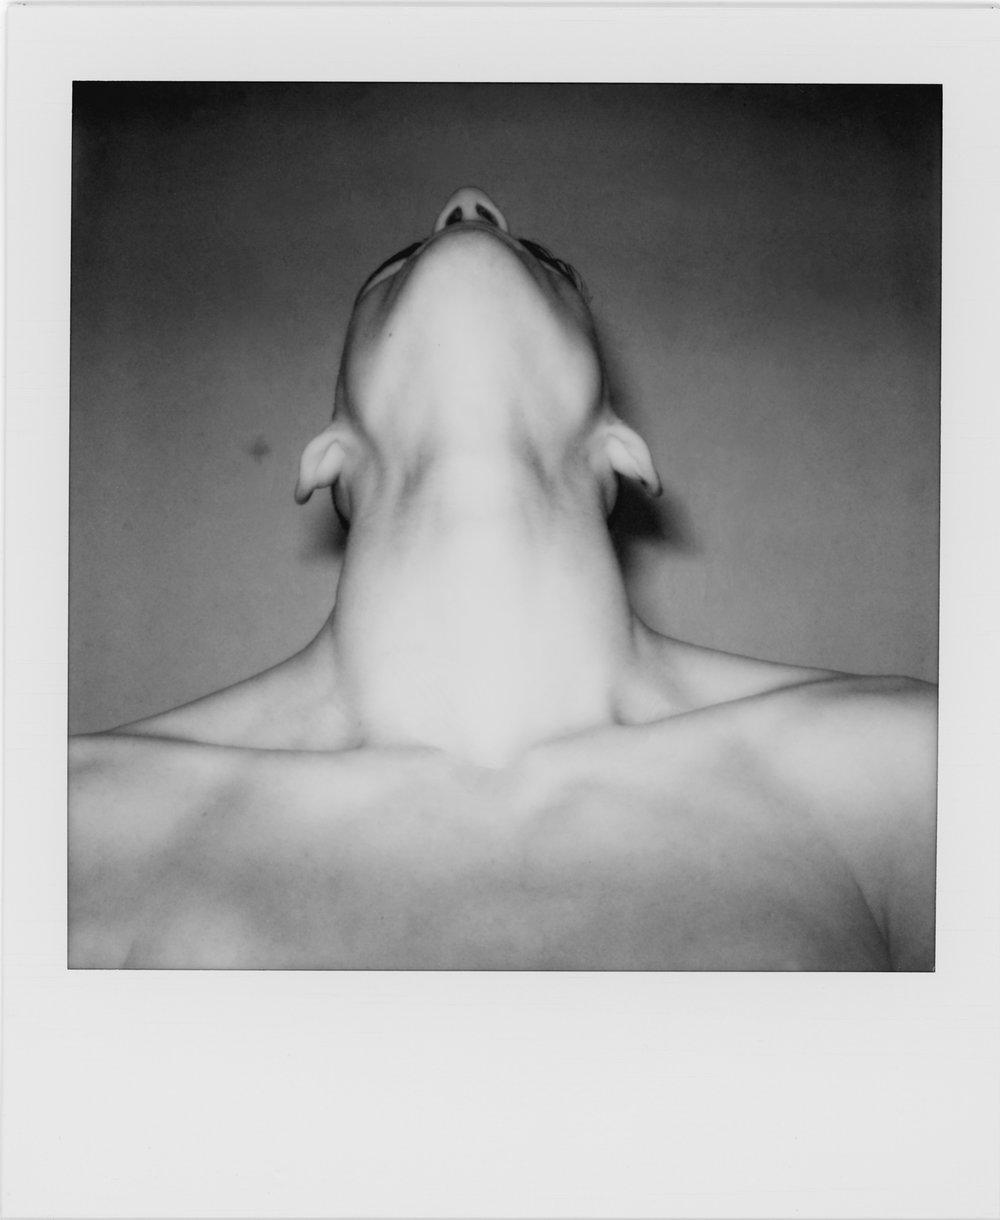 Fabien-Kruszelnicki-Ludovic-de-Saint-Sernin-Ansinth_Page_01_Image_0001.jpg